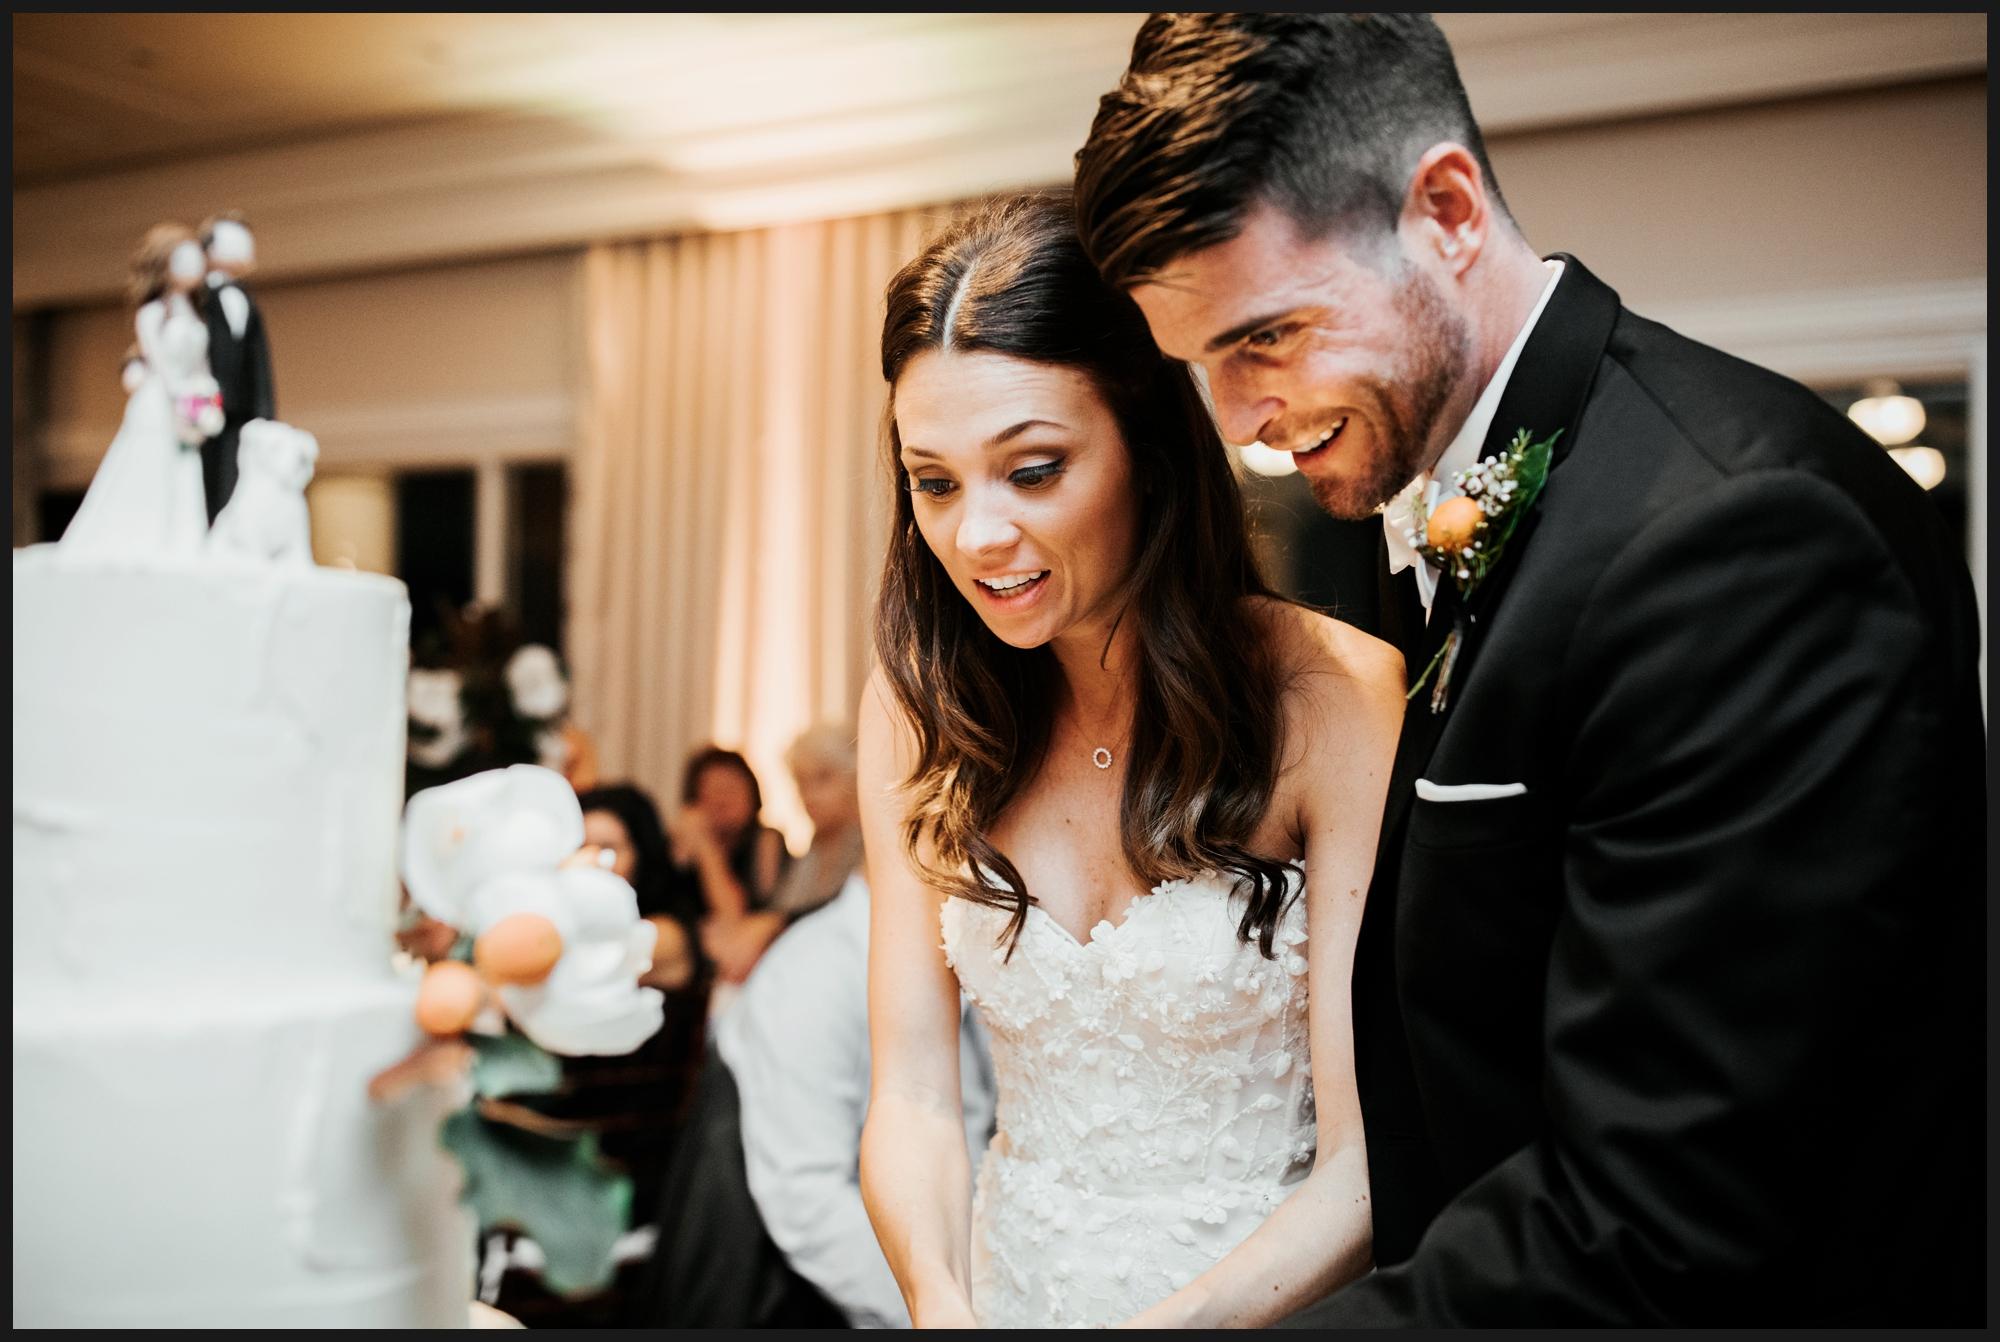 Orlando-Wedding-Photographer-destination-wedding-photographer-florida-wedding-photographer-hawaii-wedding-photographer_0252.jpg